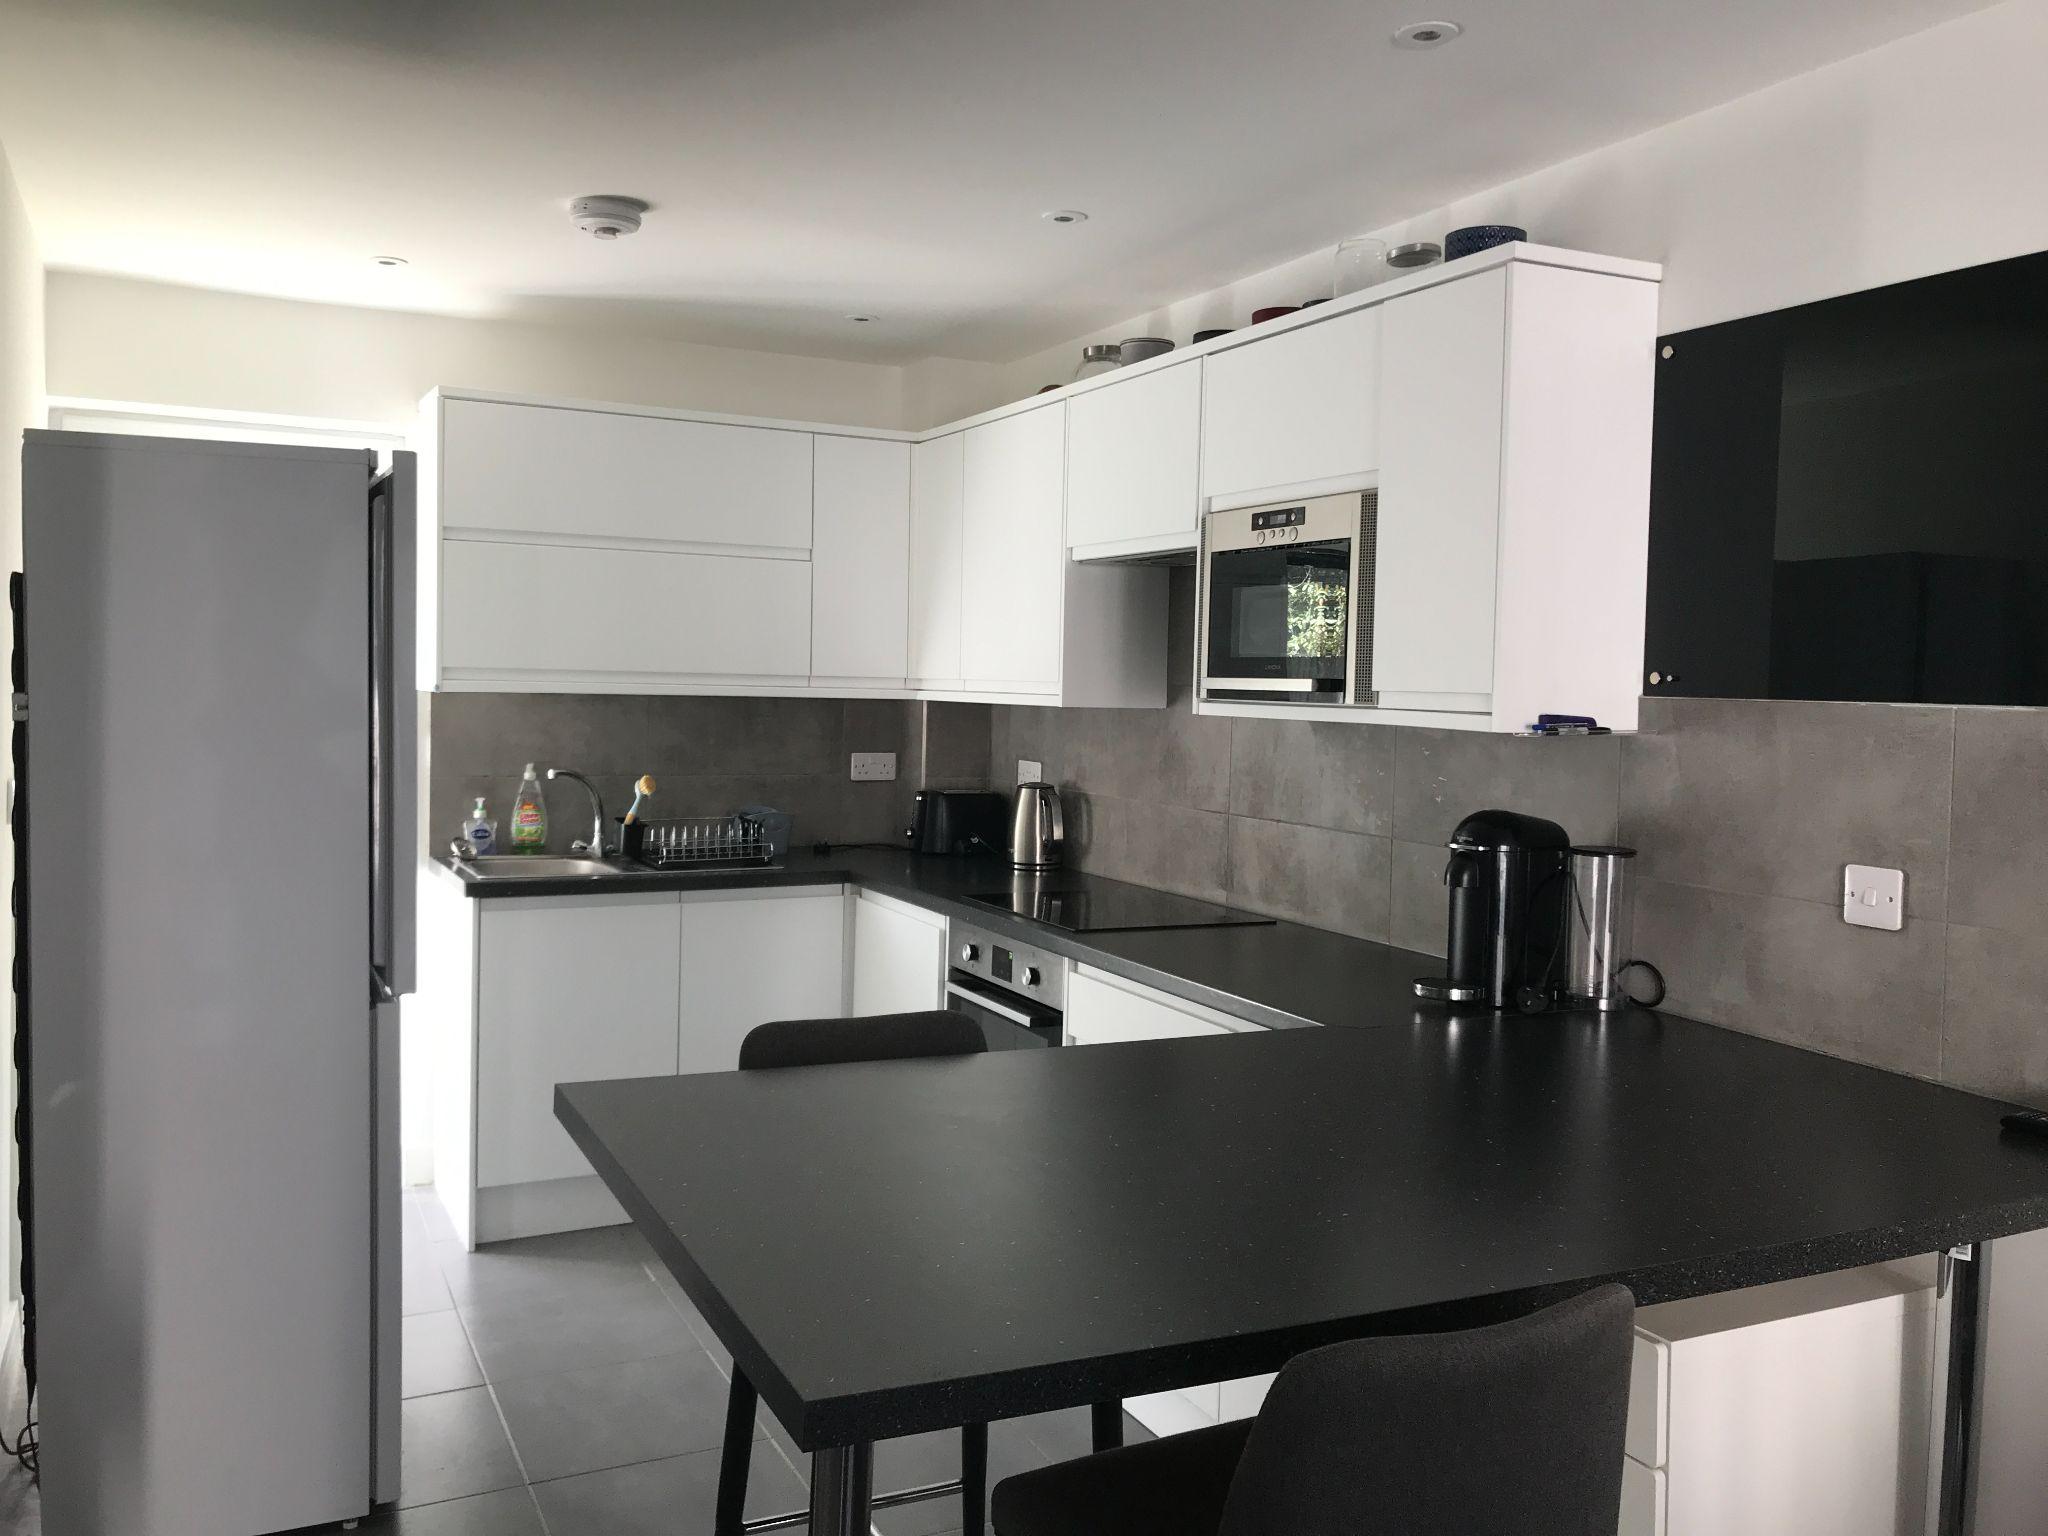 2 Bedroom Apartment Flat/apartment - Photograph 2